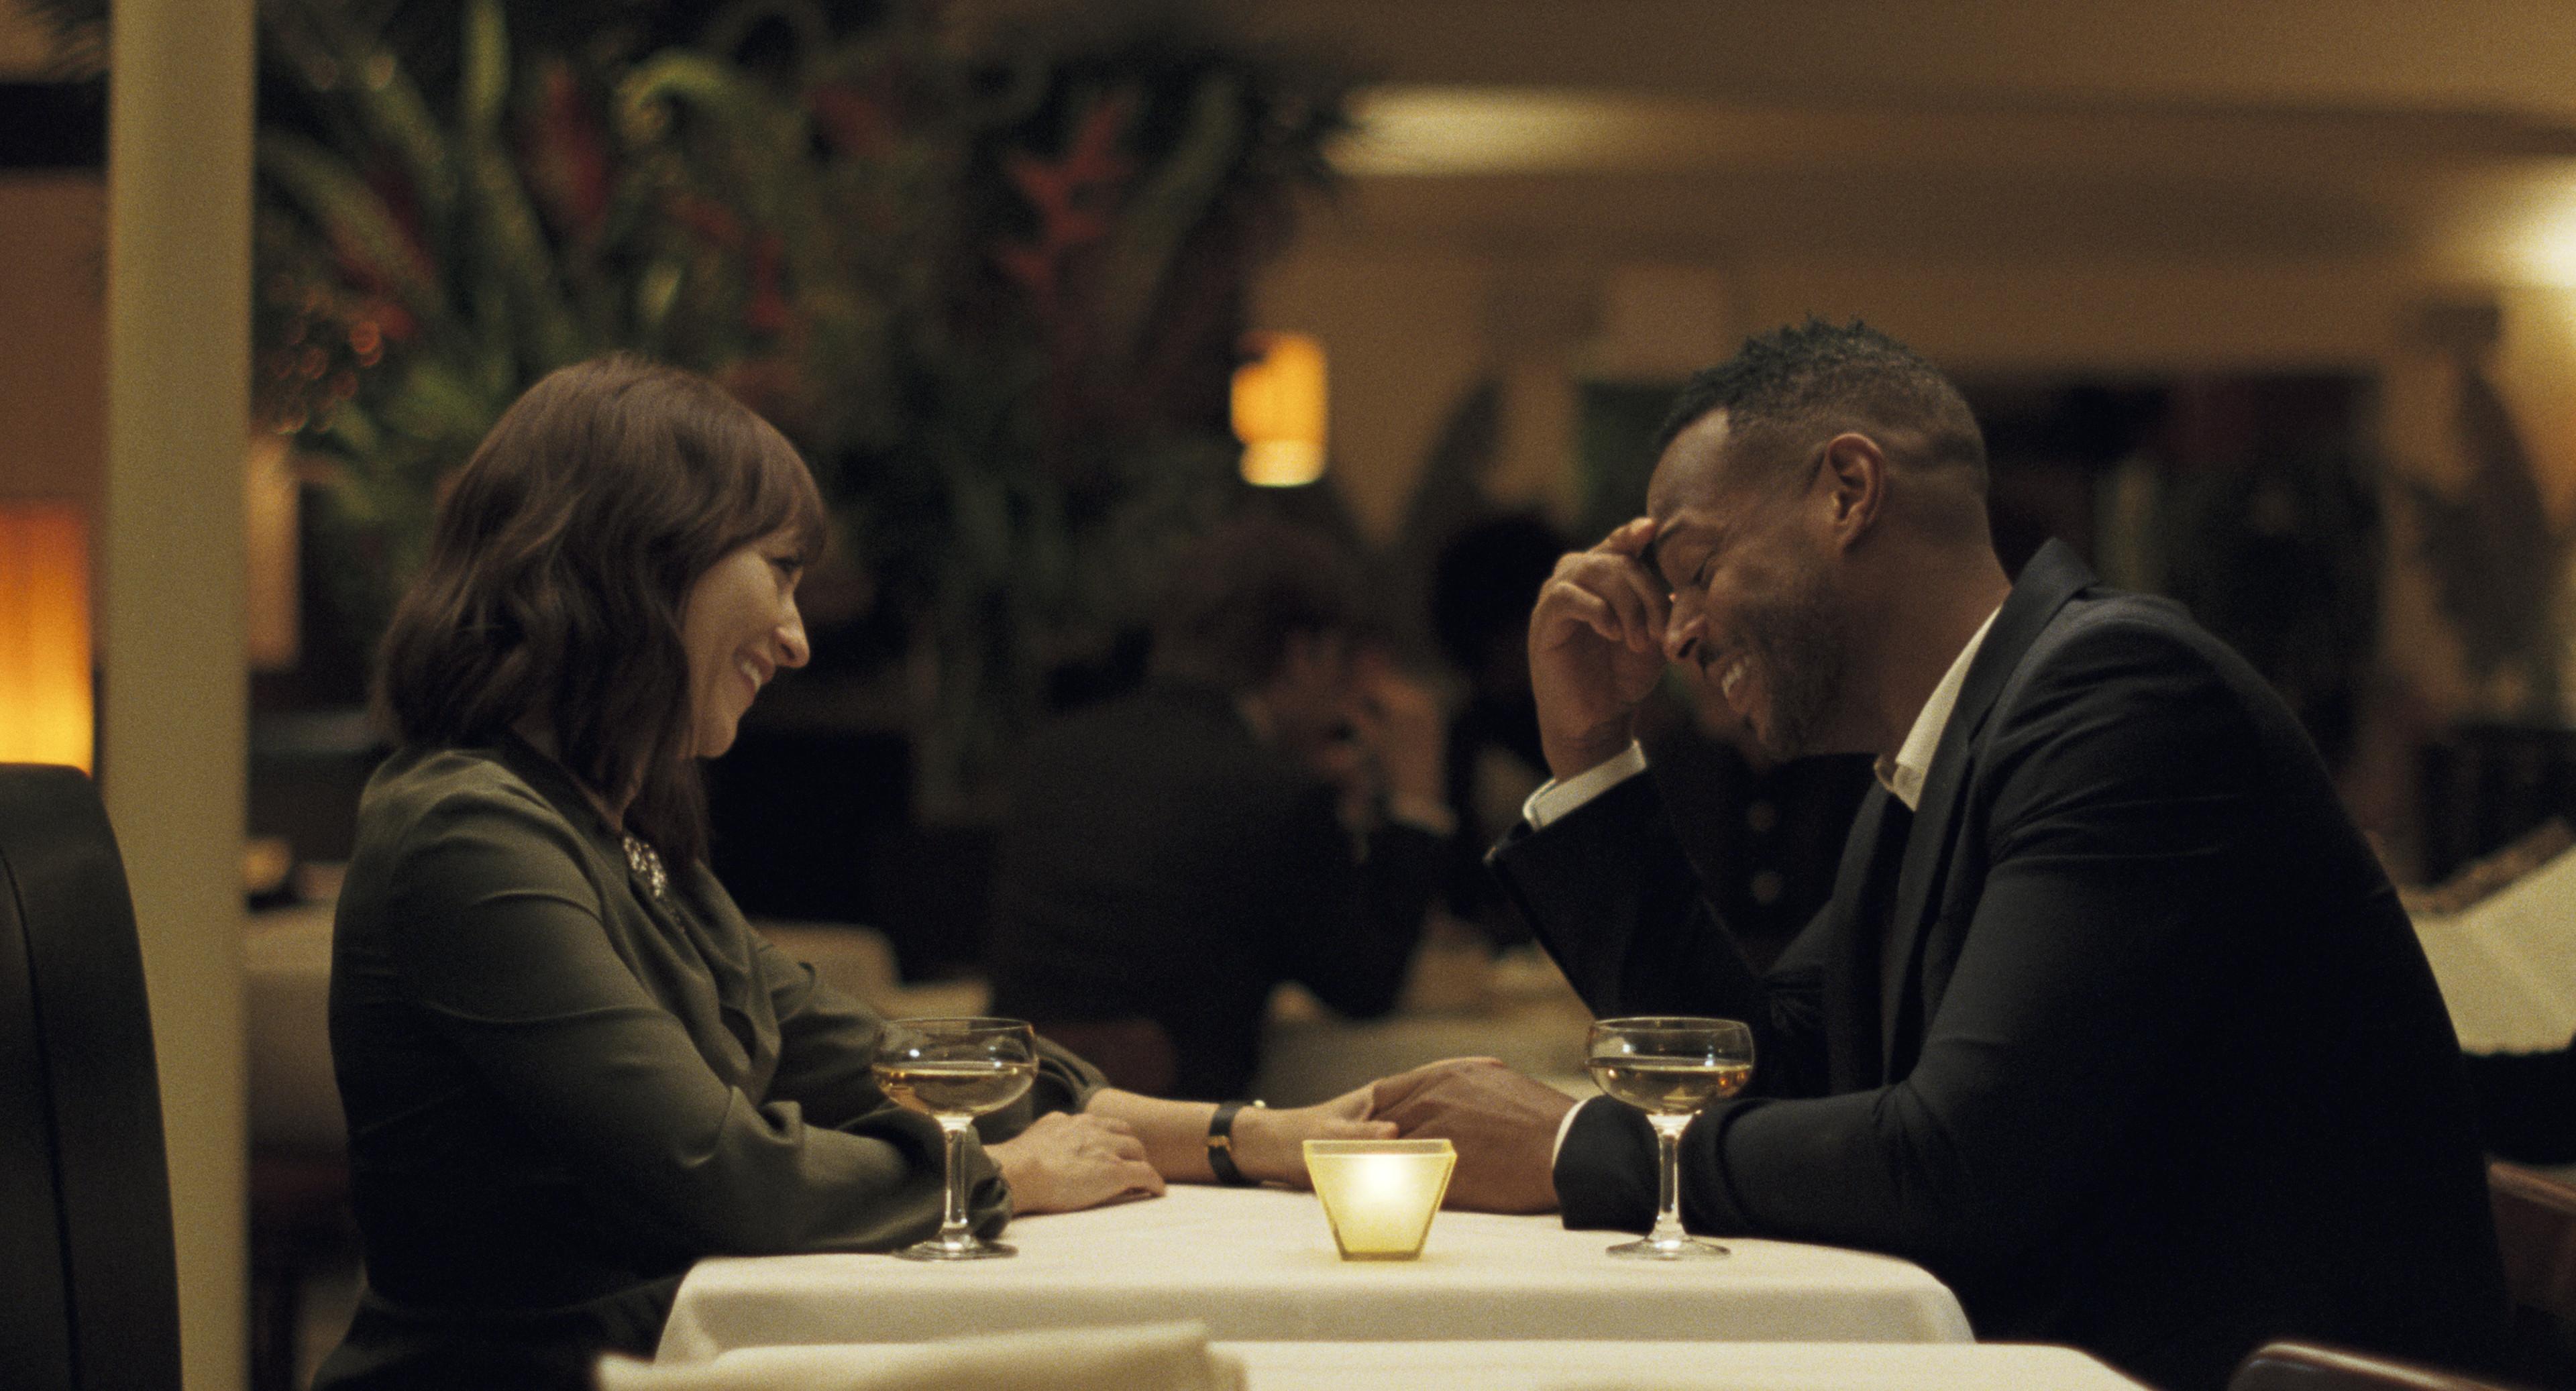 Filmrecensie 'On the rocks':Komisch drama Sofia Coppola minder warm